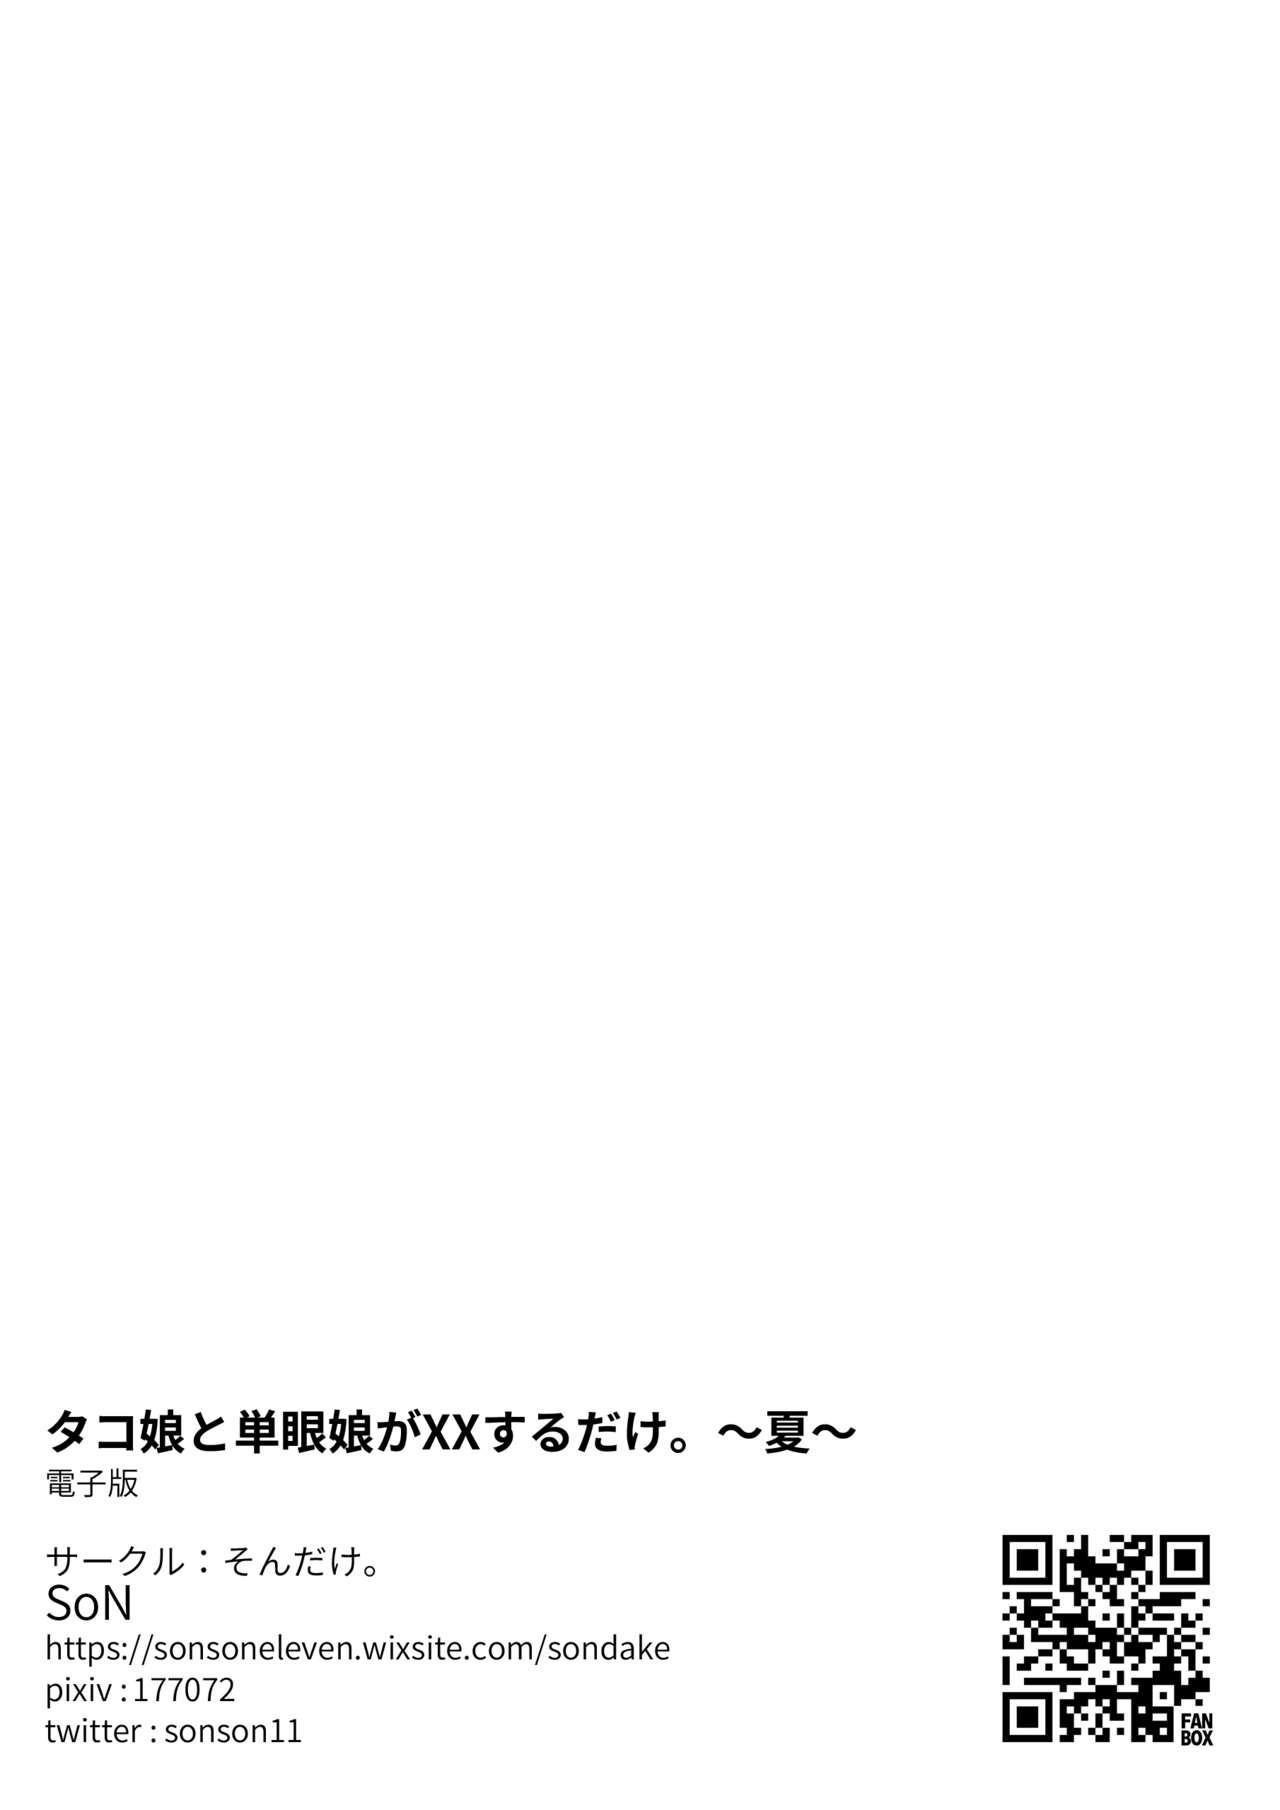 Tako Musume to Tangan Musume ga XX Suru dake. 11